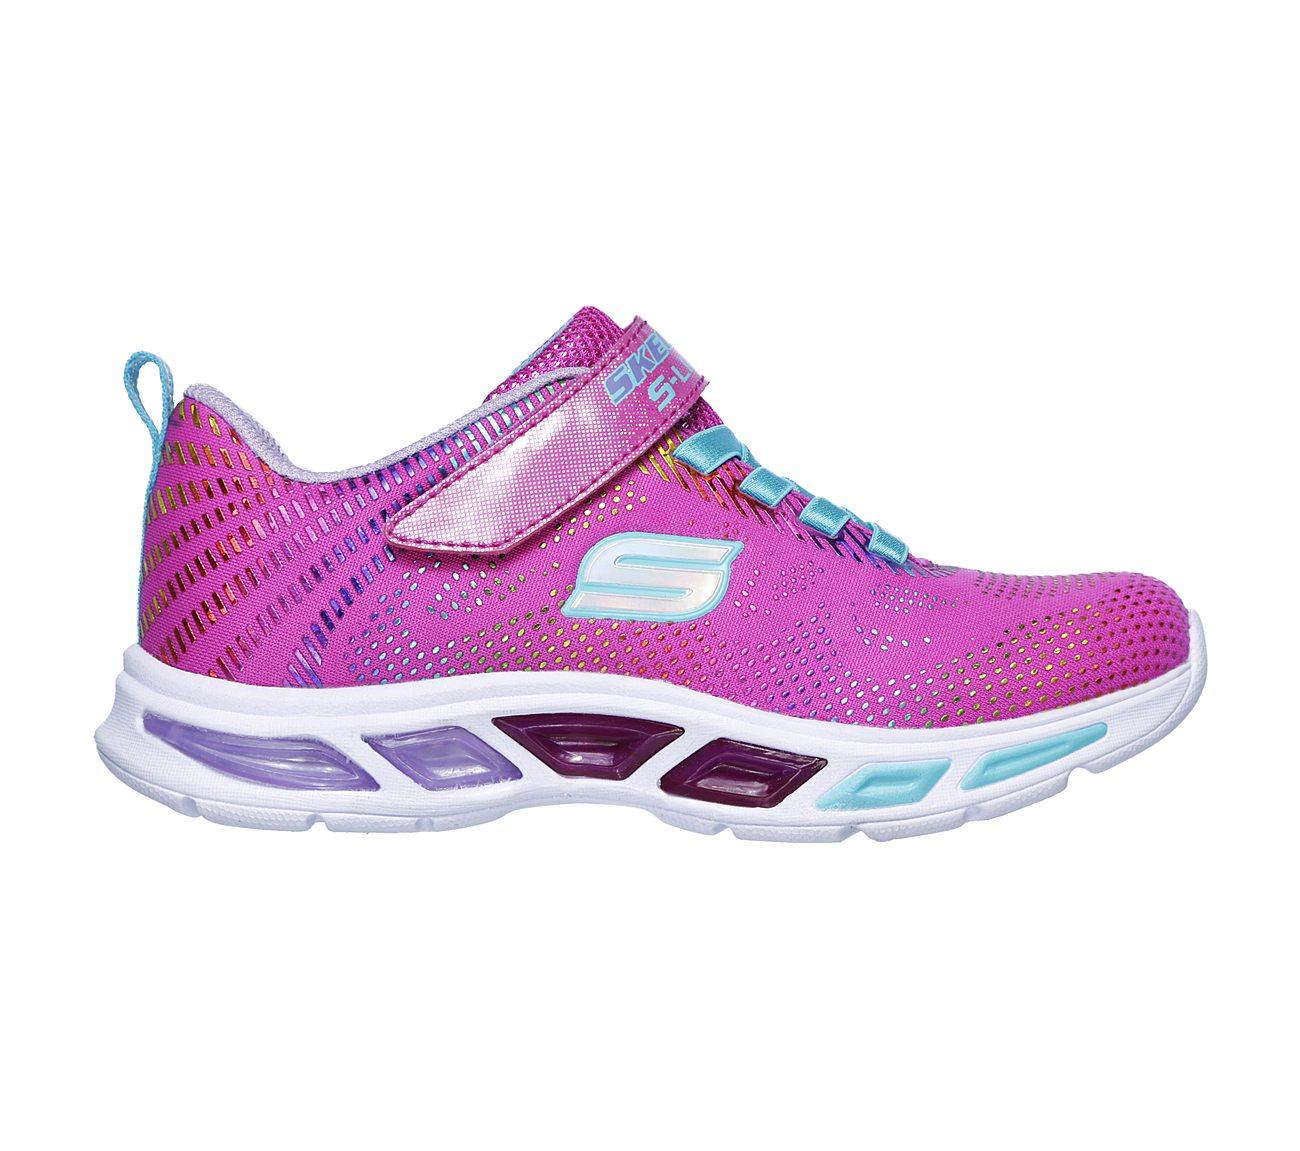 18bd52304b53 Buy SKECHERS S Lights  Litebeams - Gleam N  Dream S-Lights Shoes only  42.00